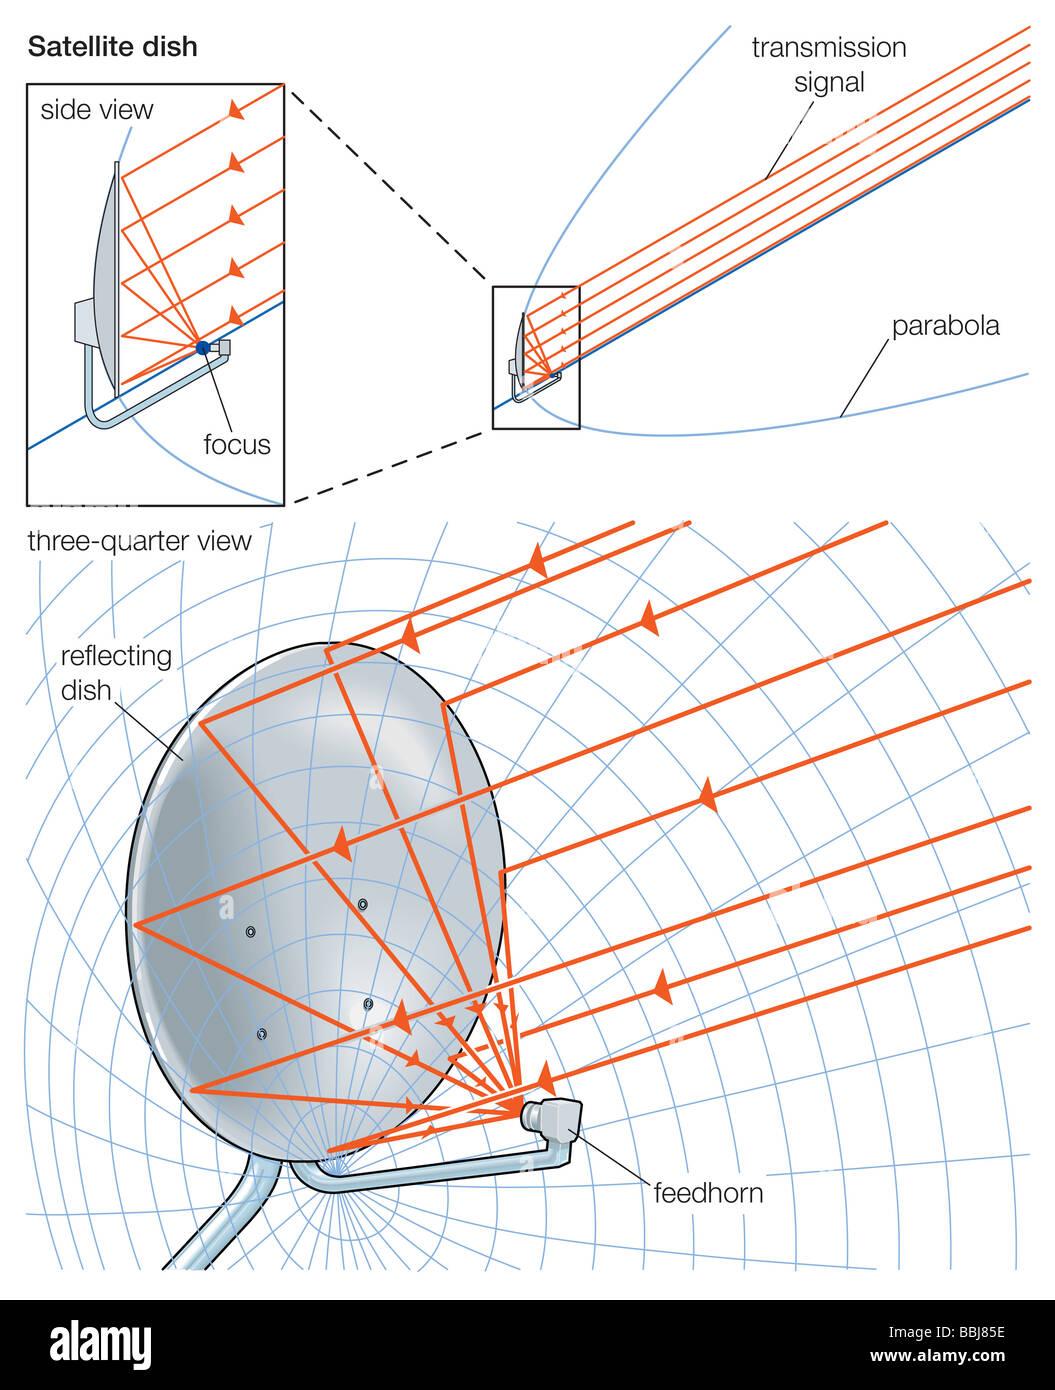 hight resolution of satellite dish diagrams wiring diagram pass satellite dish diagrams